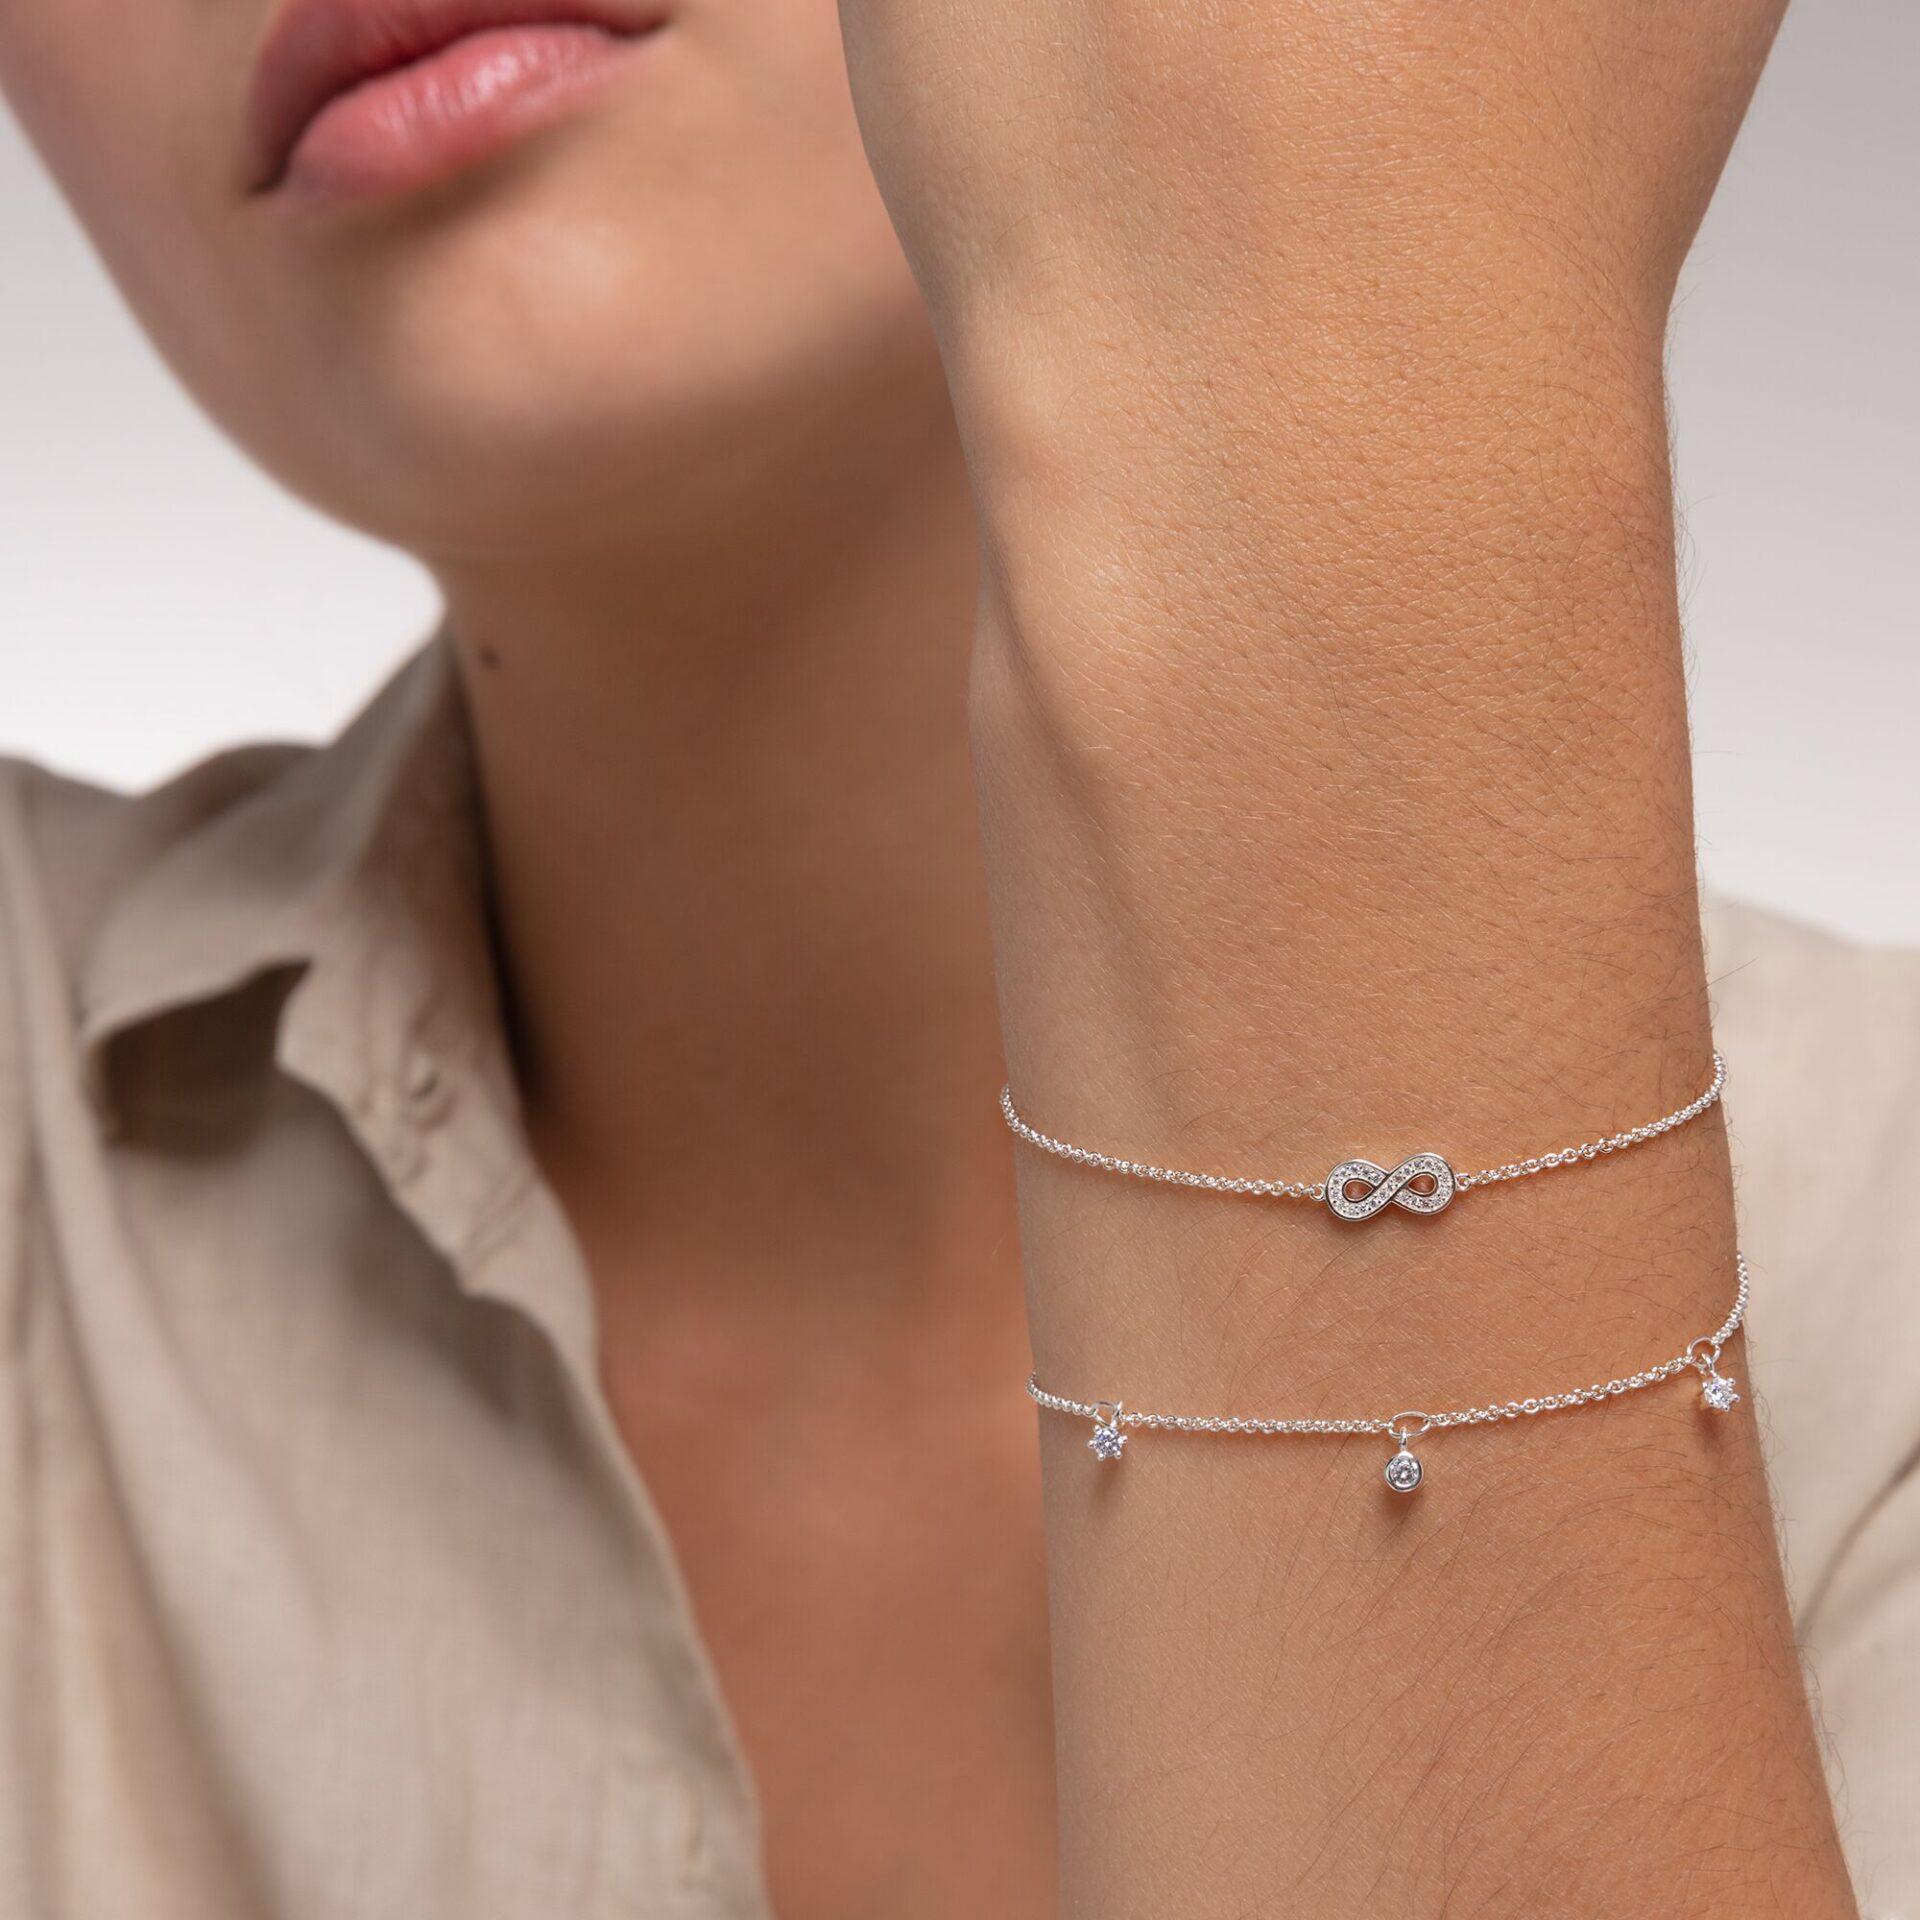 Bracelet pierres blanches argent, Thomas Sabo